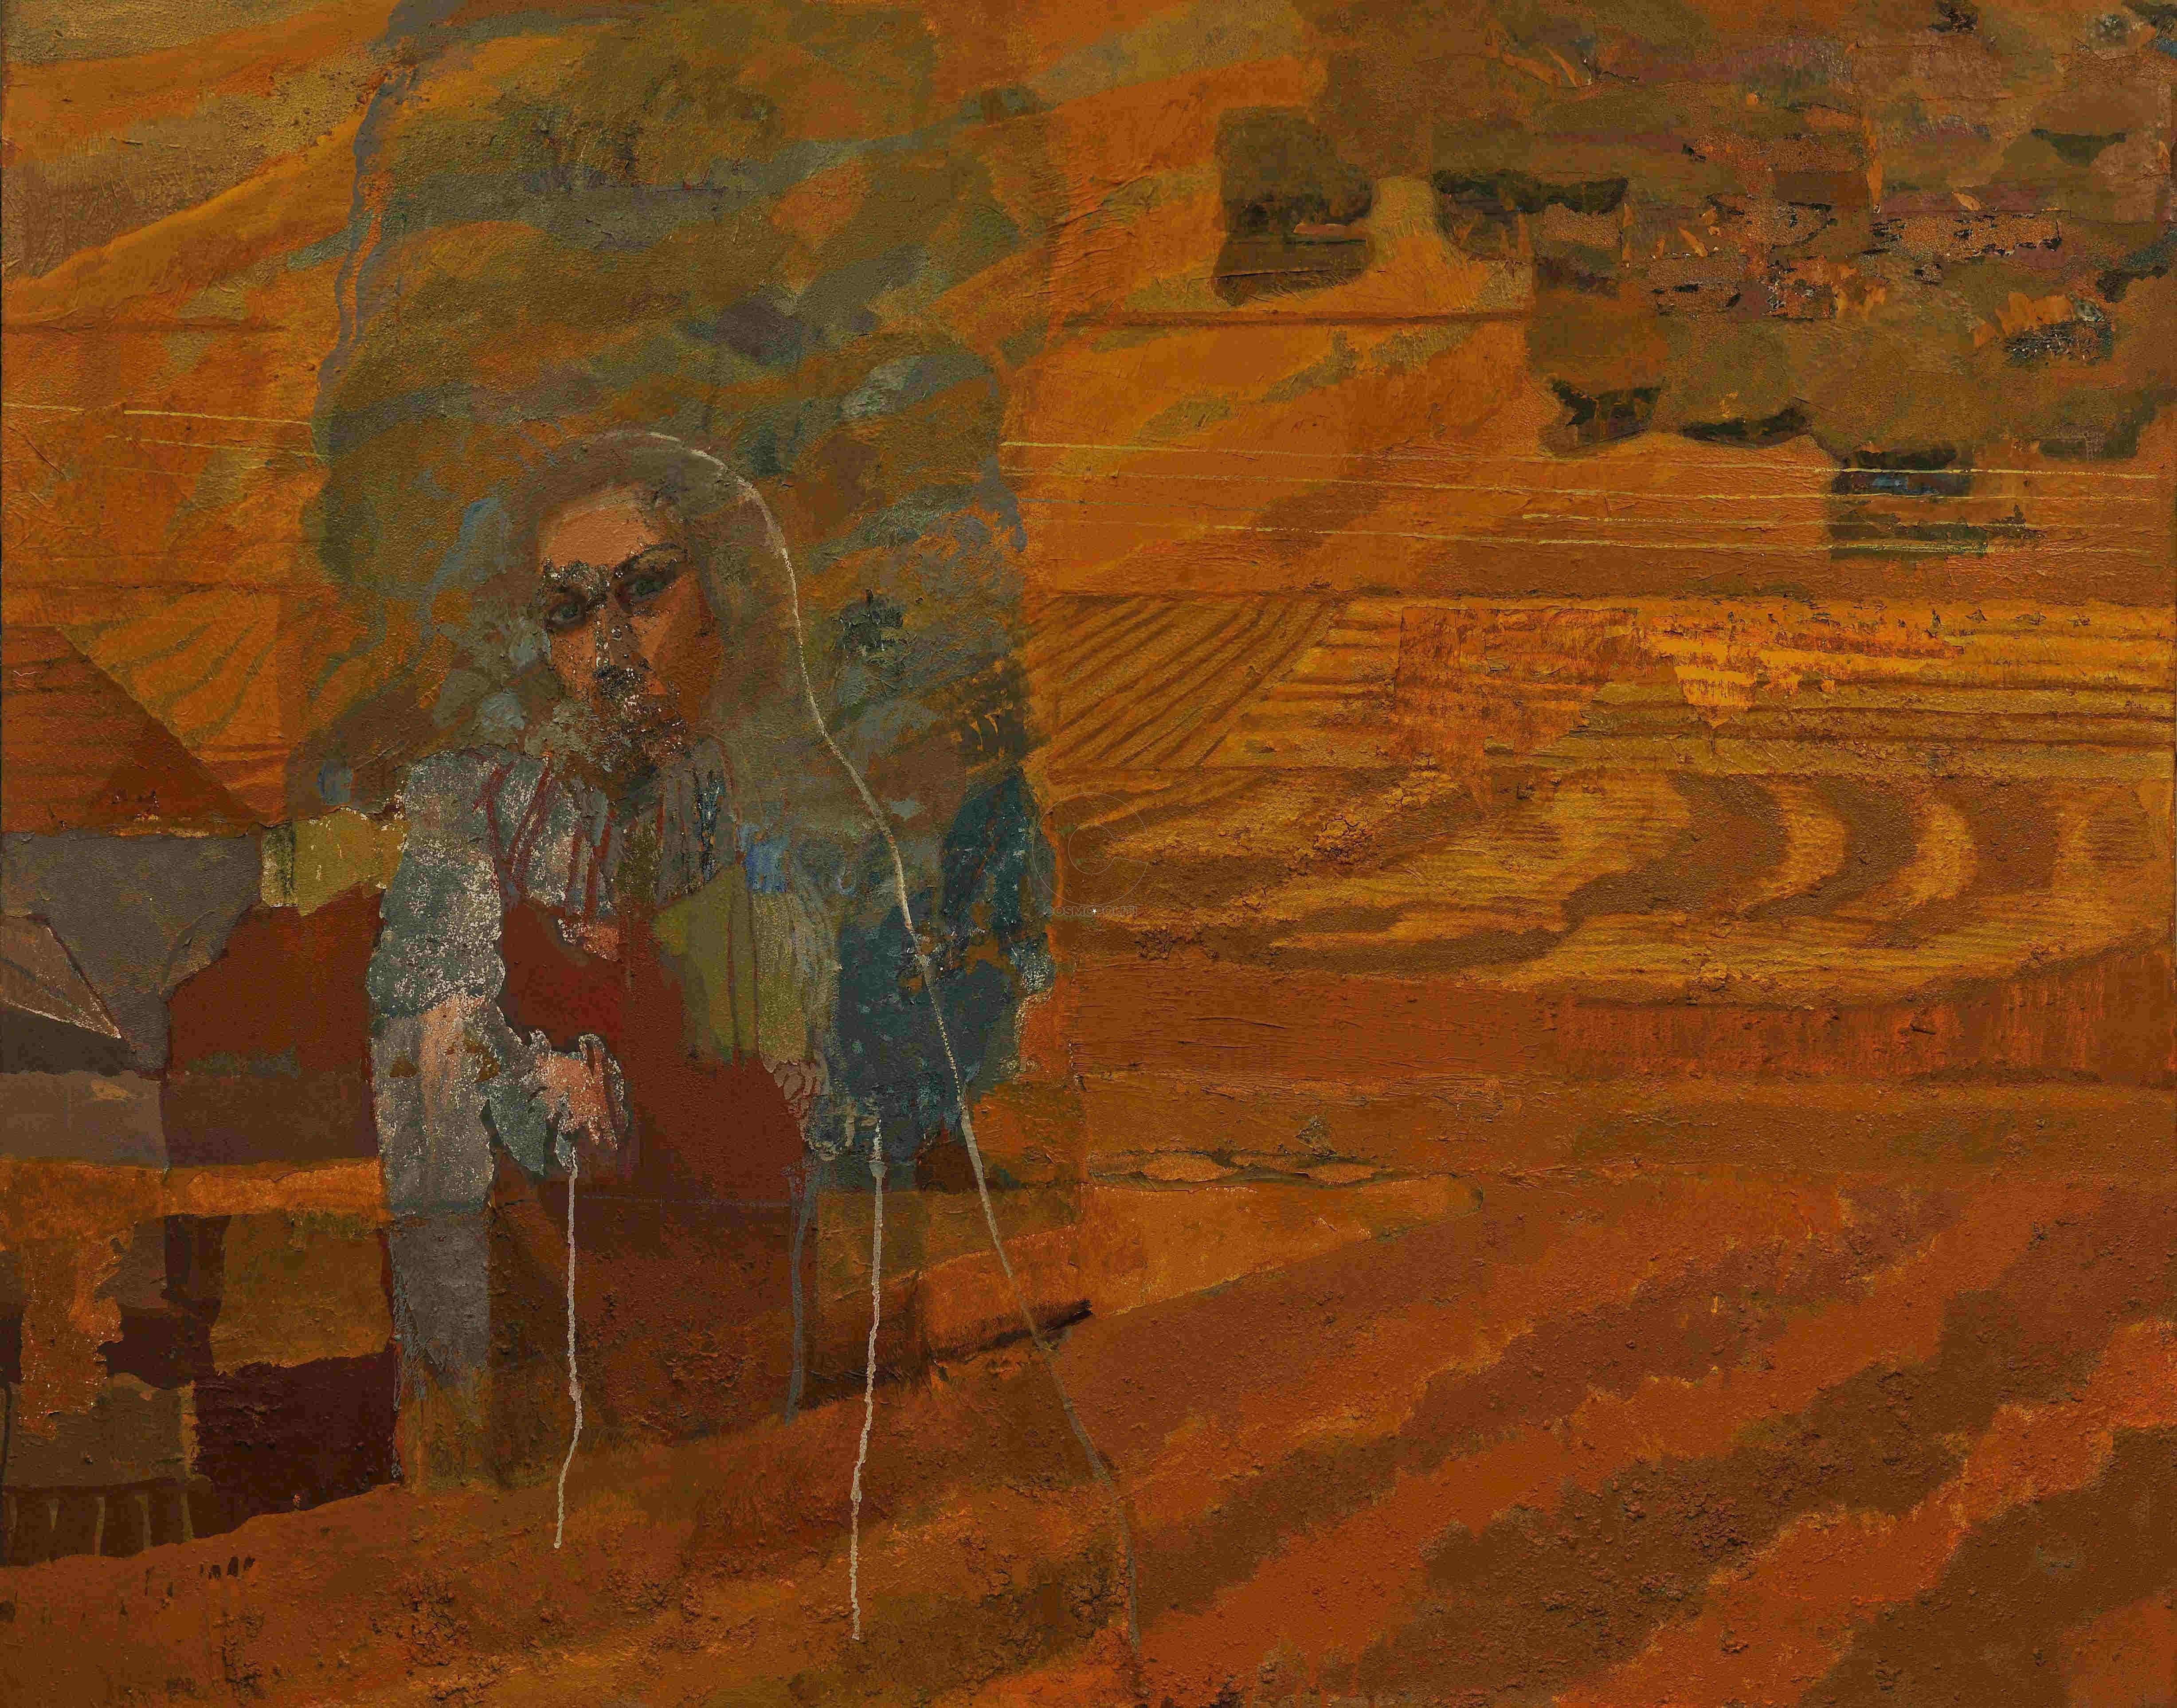 EL. PAULOPOULOU Mather Erth 130x170cm